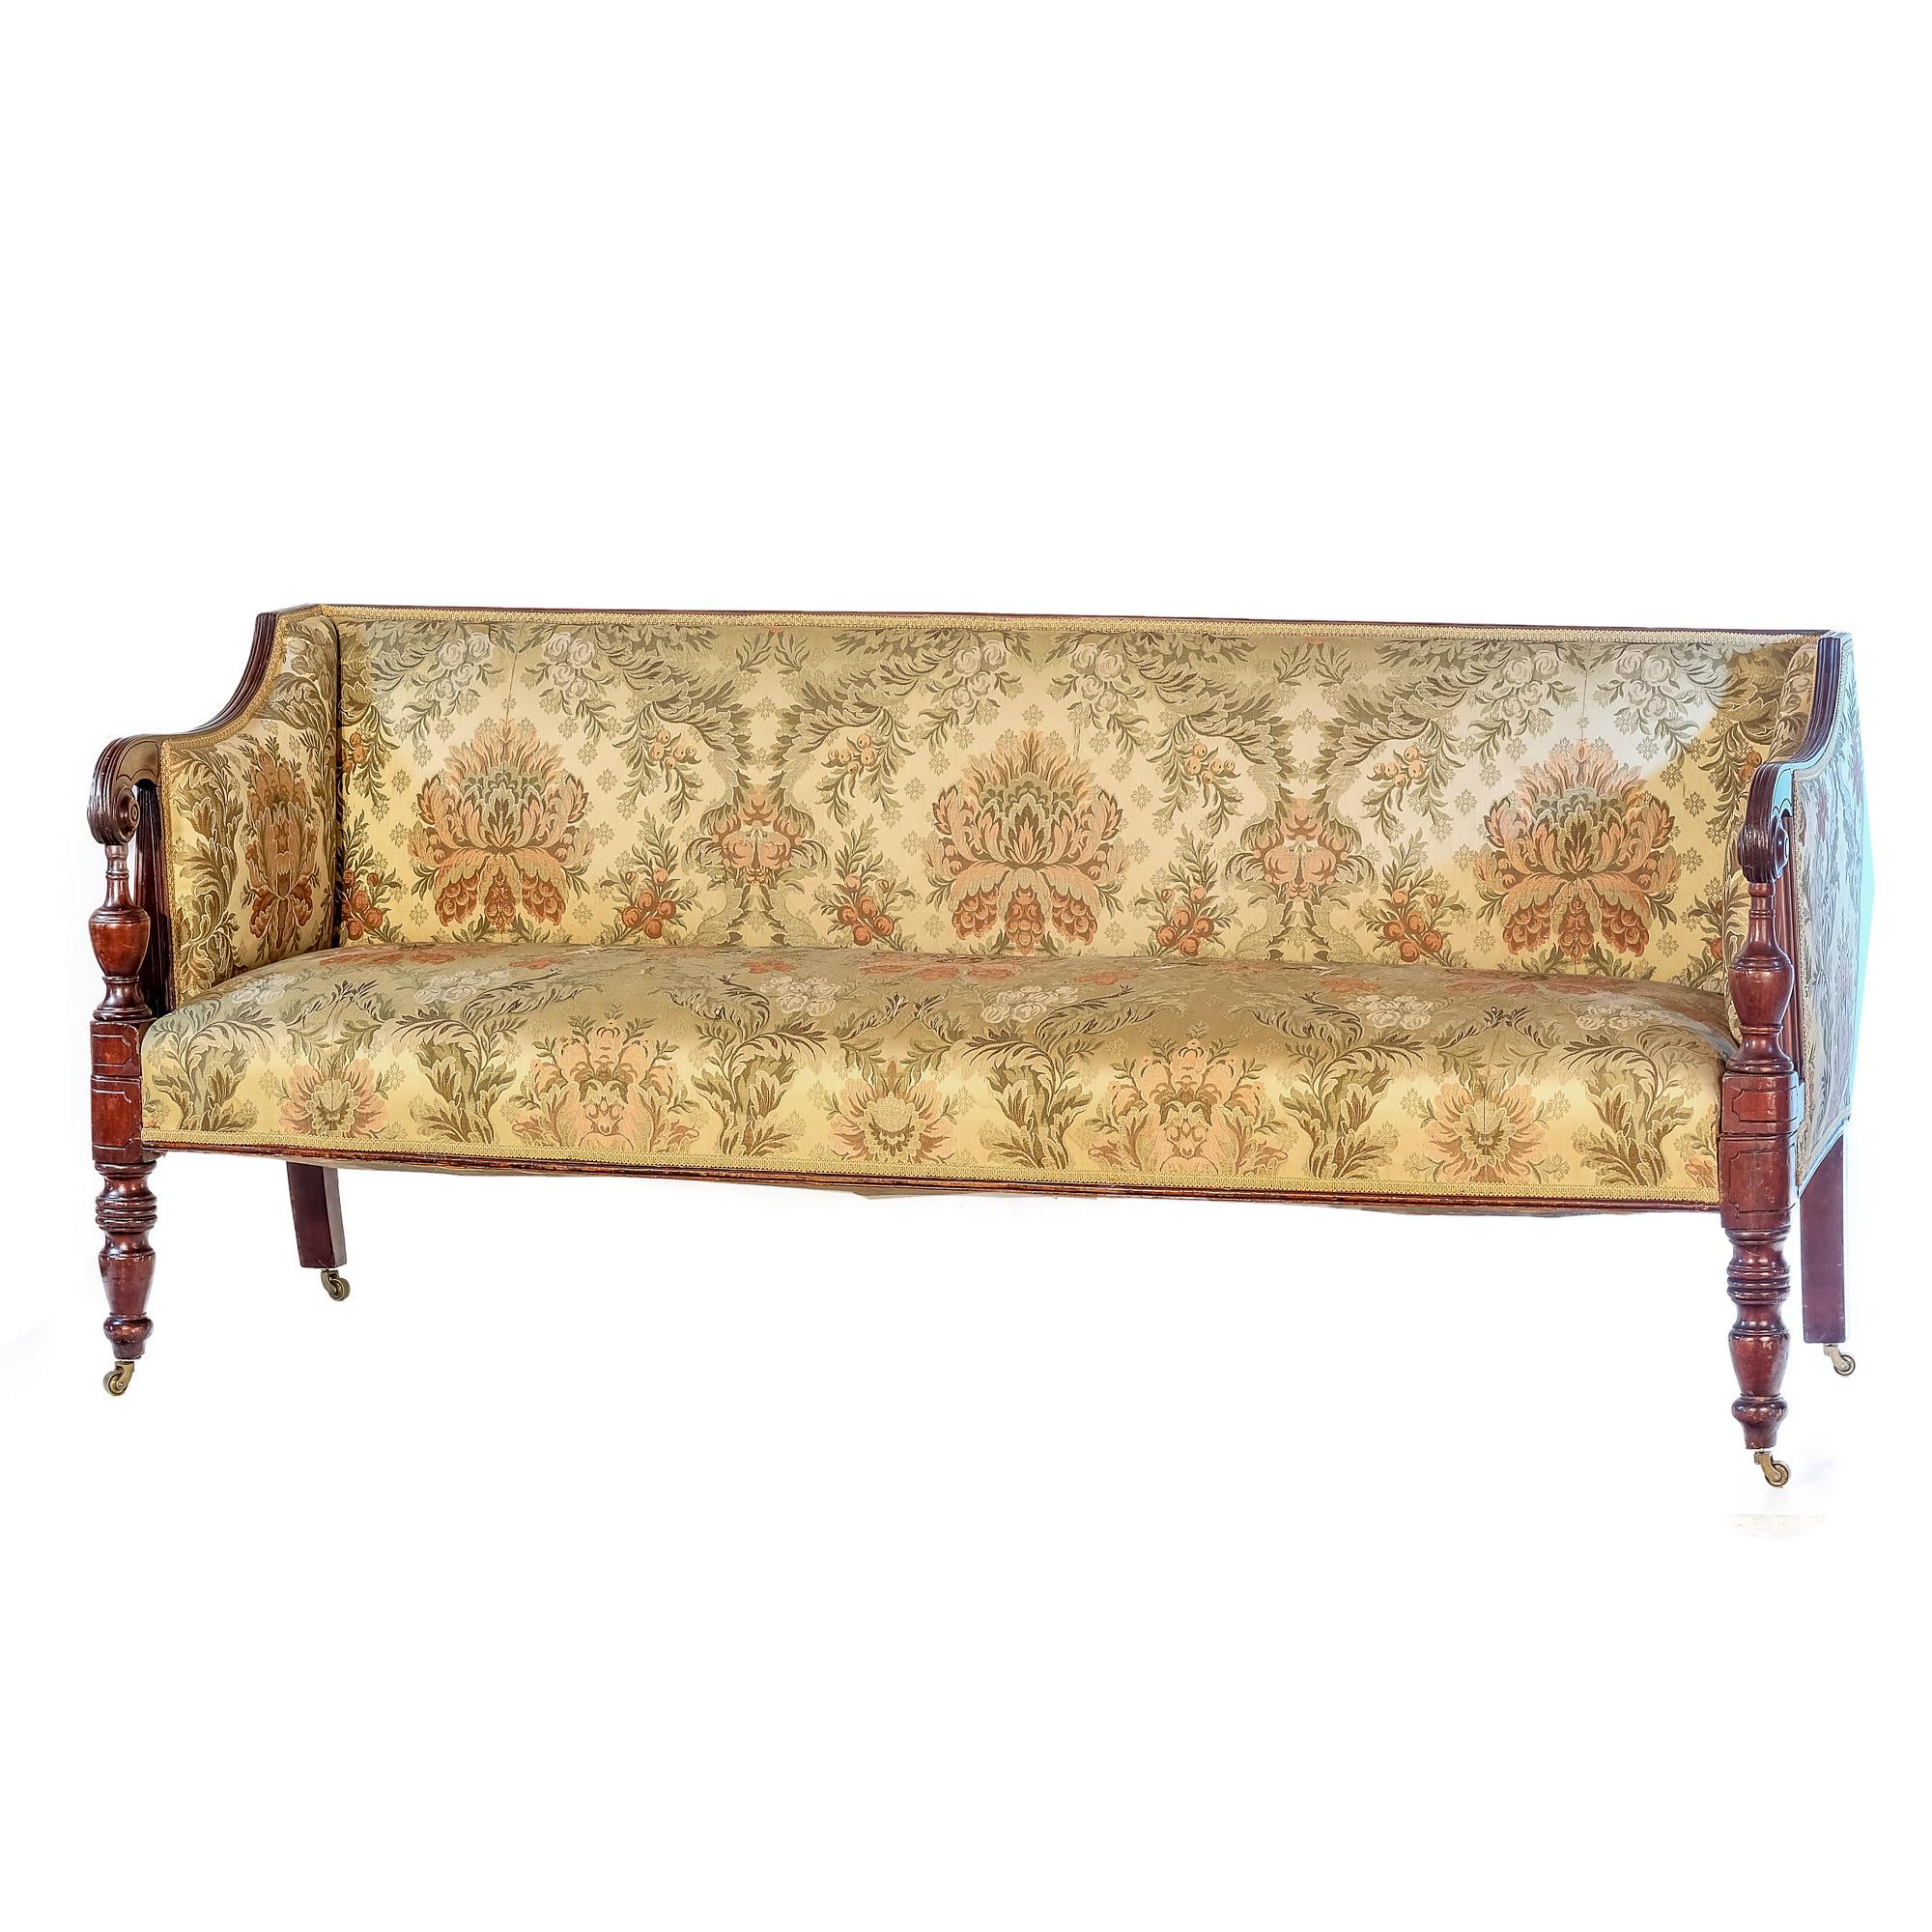 'George III Sheraton Mahogany and Floral Upholstered Sofa Circa 1800'